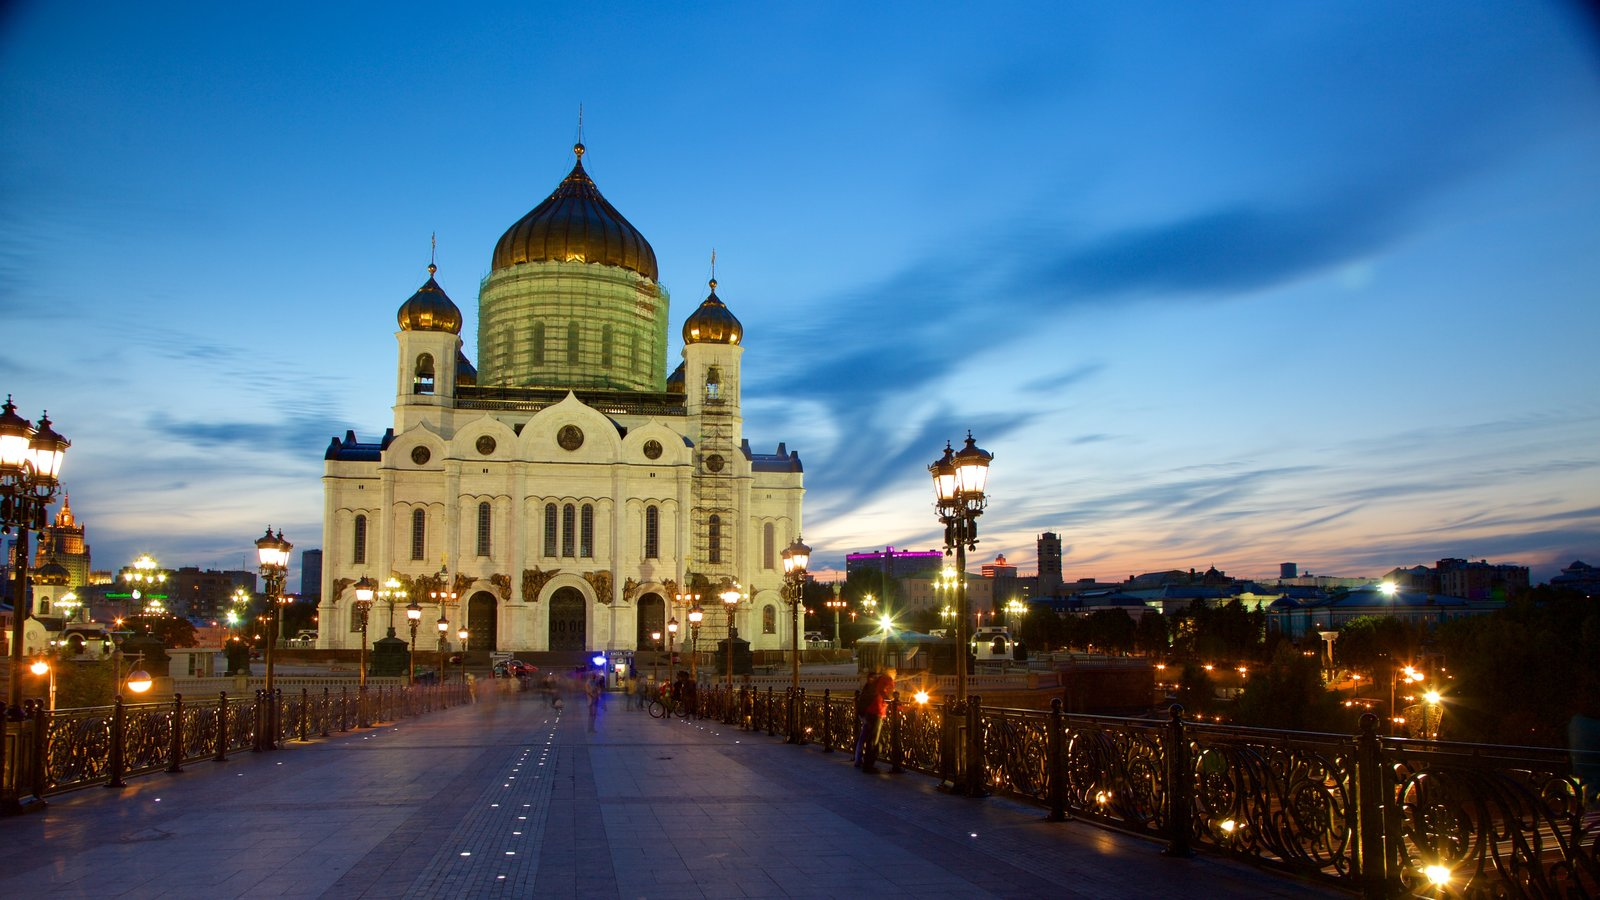 Catedral de Cristo Salvador caracterizando cenas noturnas e arquitetura de patrimônio